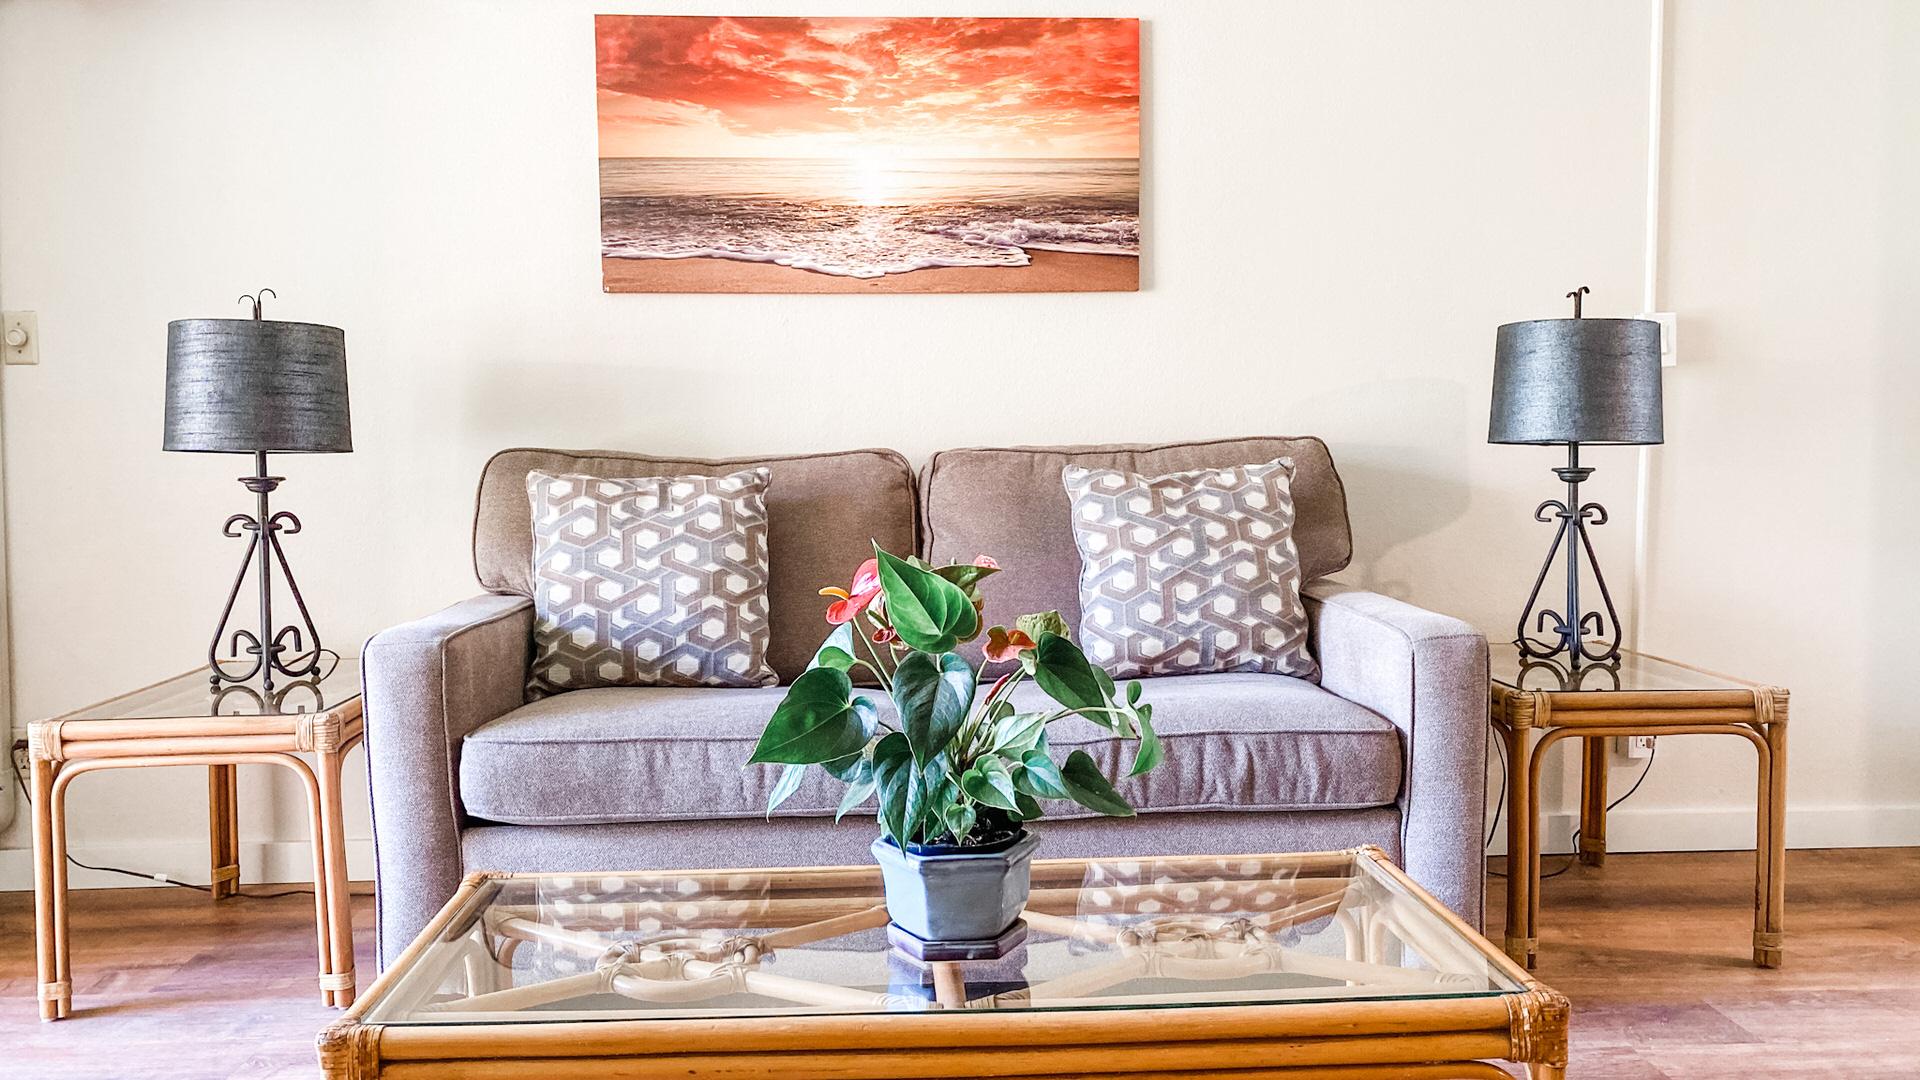 C101 Sofa and Coffee Table